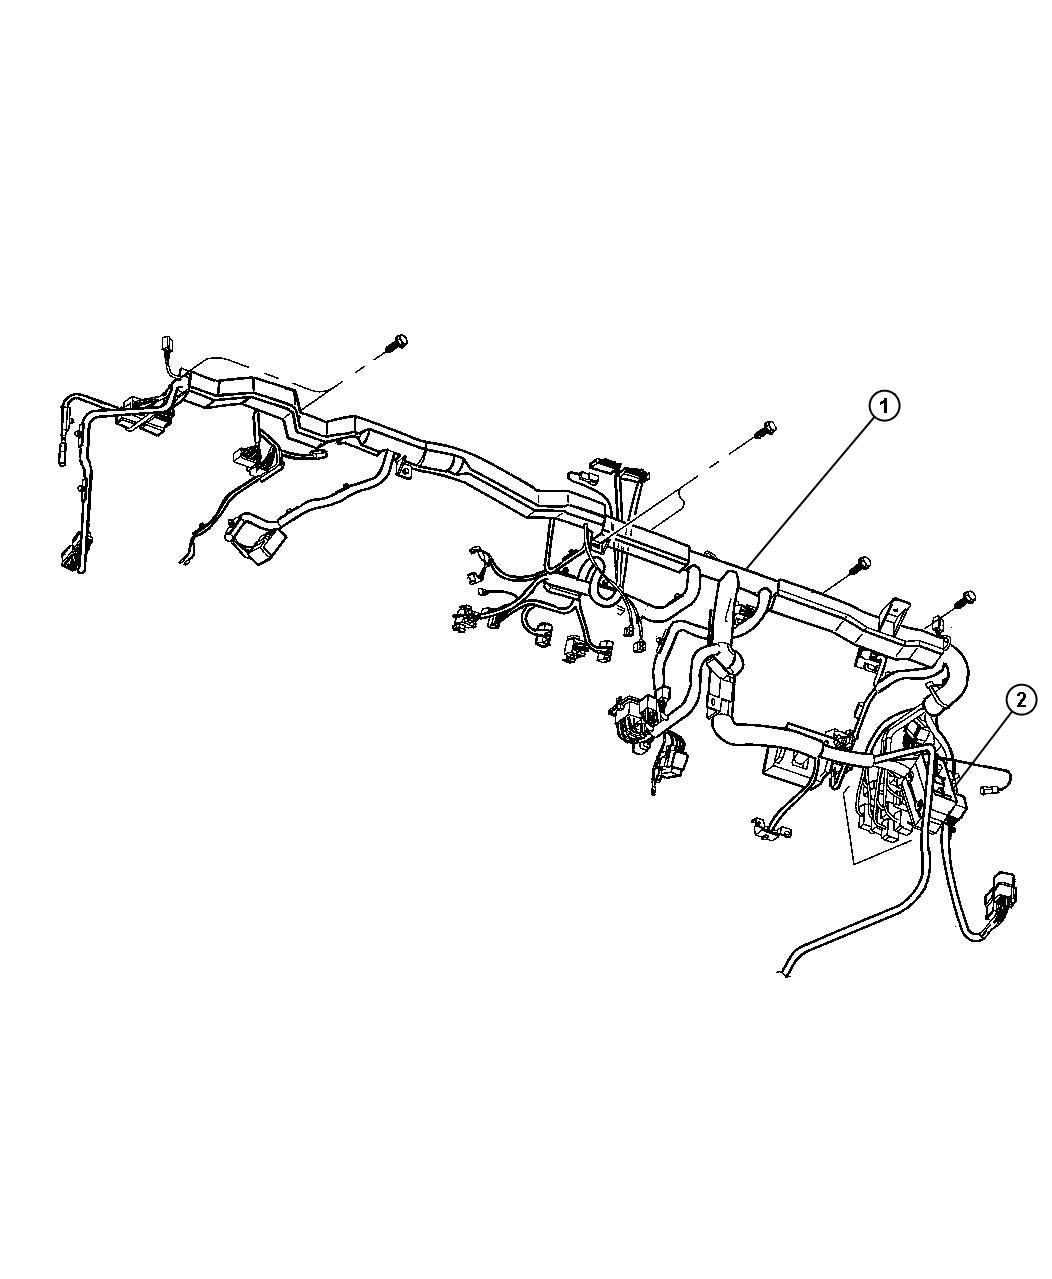 [DIAGRAM] 2002 Chrysler Concorde Fuse Box Wiring Diagram